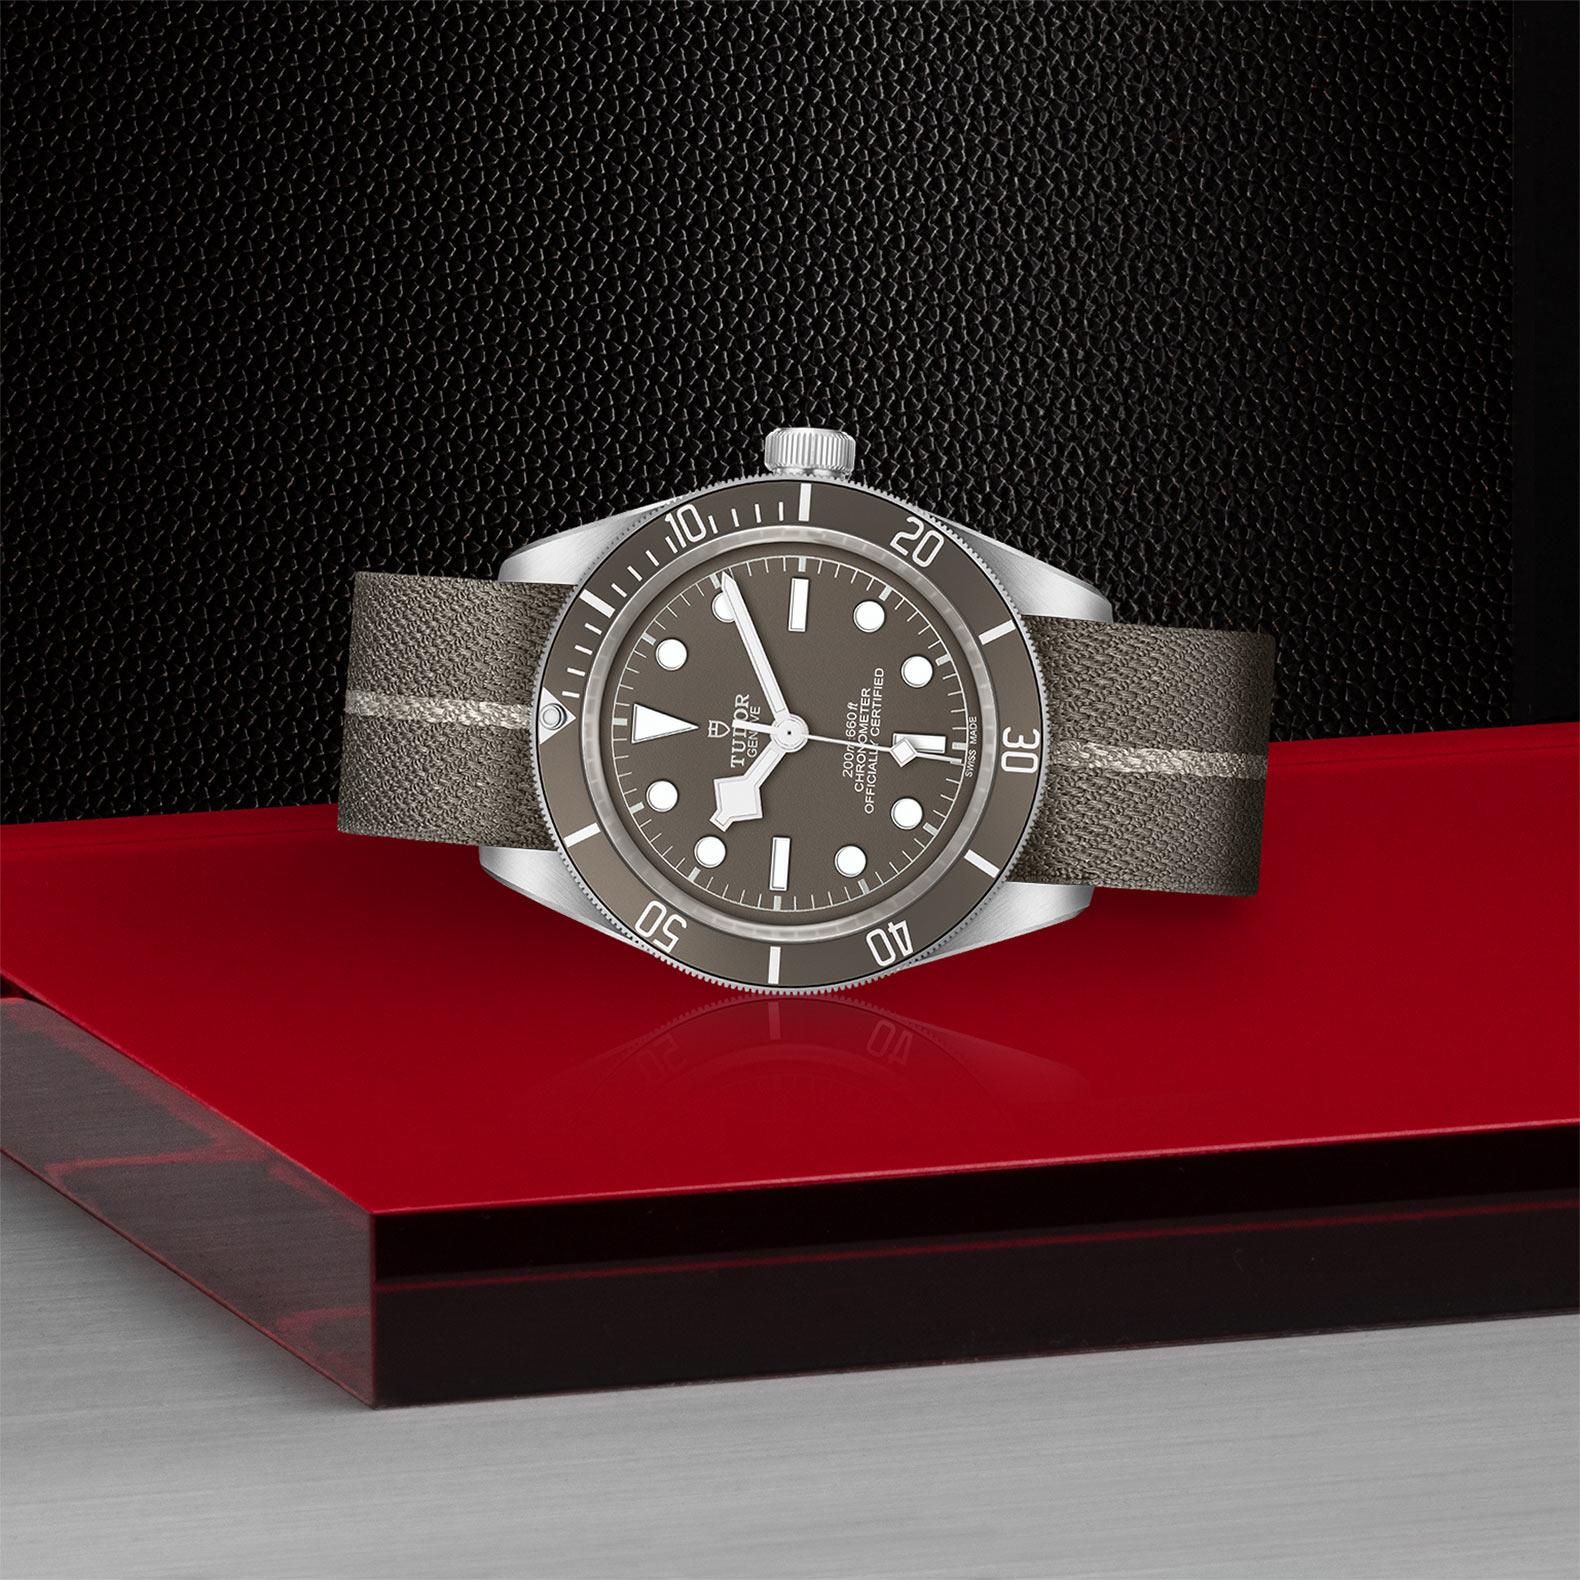 Tudor Black Bay Fifty-Eight M79010SG-0002